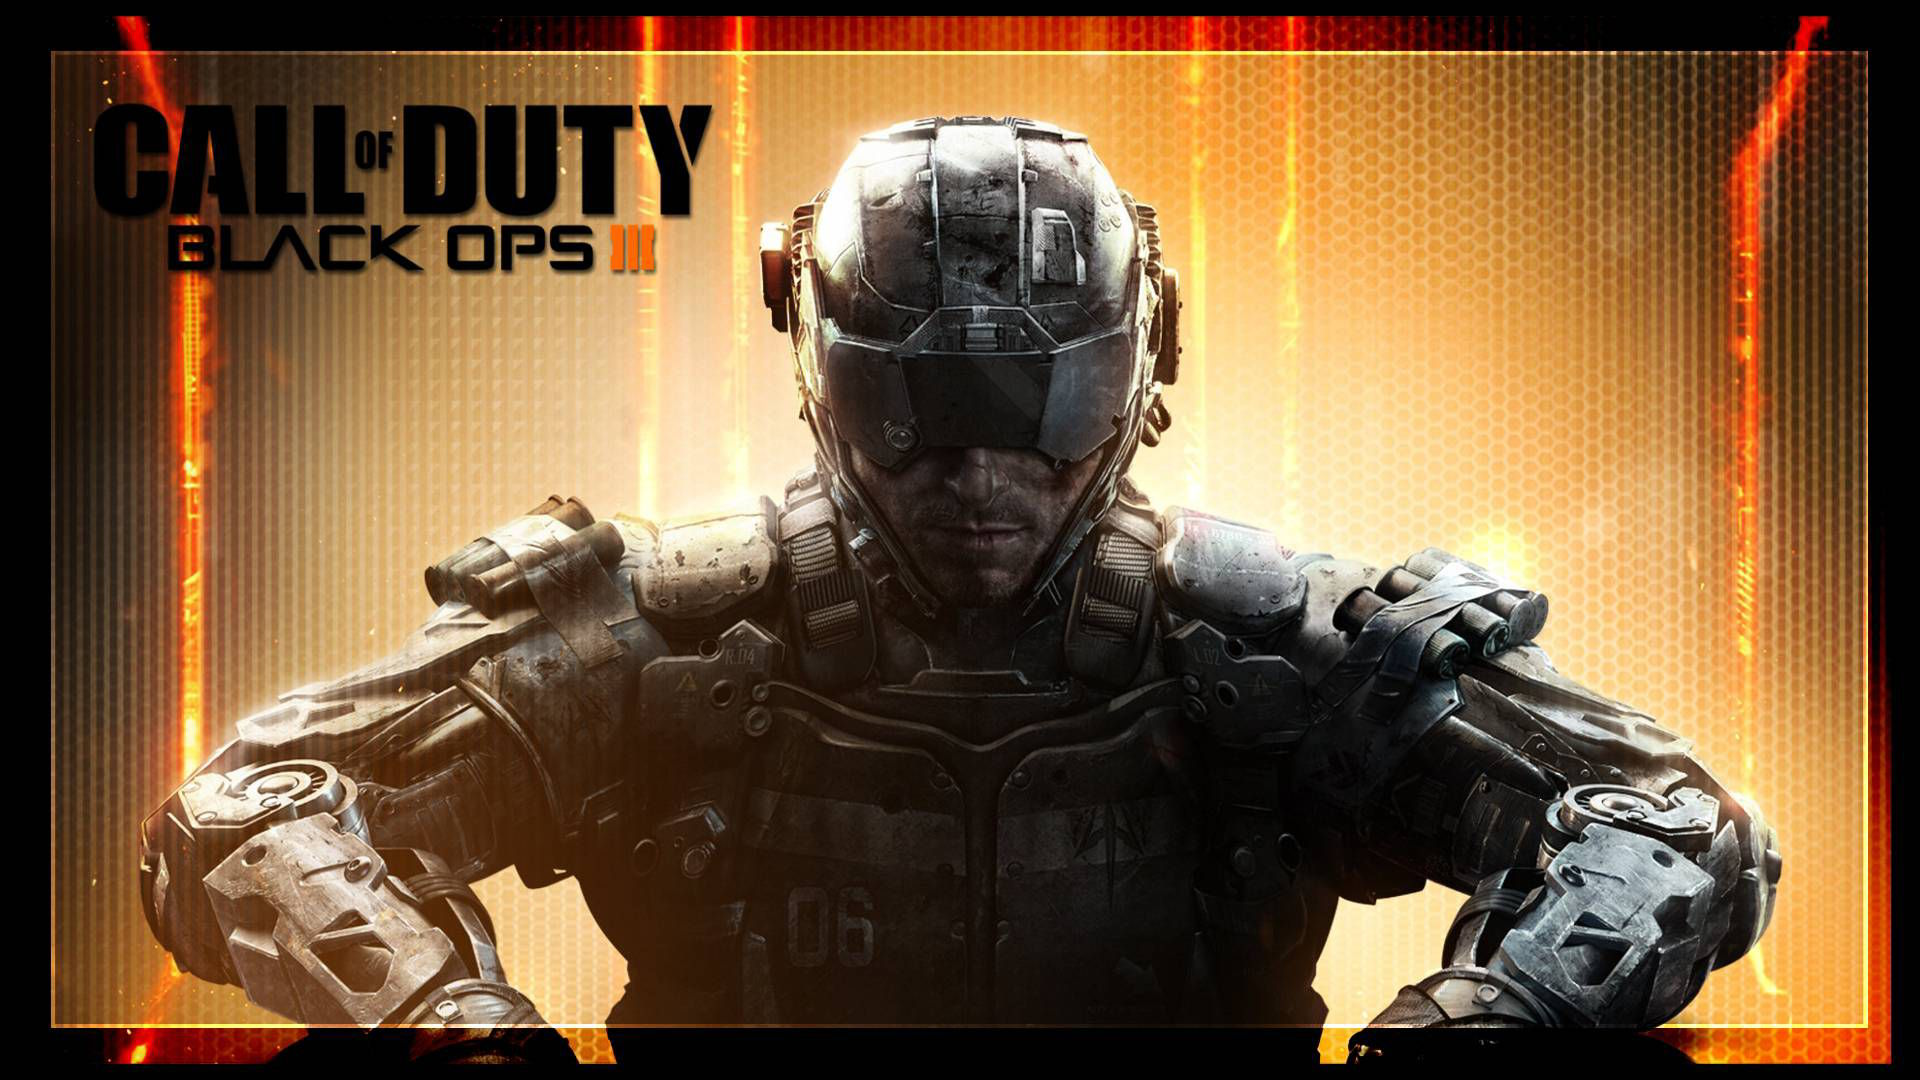 Black Ops 3 PS3 ve Xbox 360'da Oynanabilecek